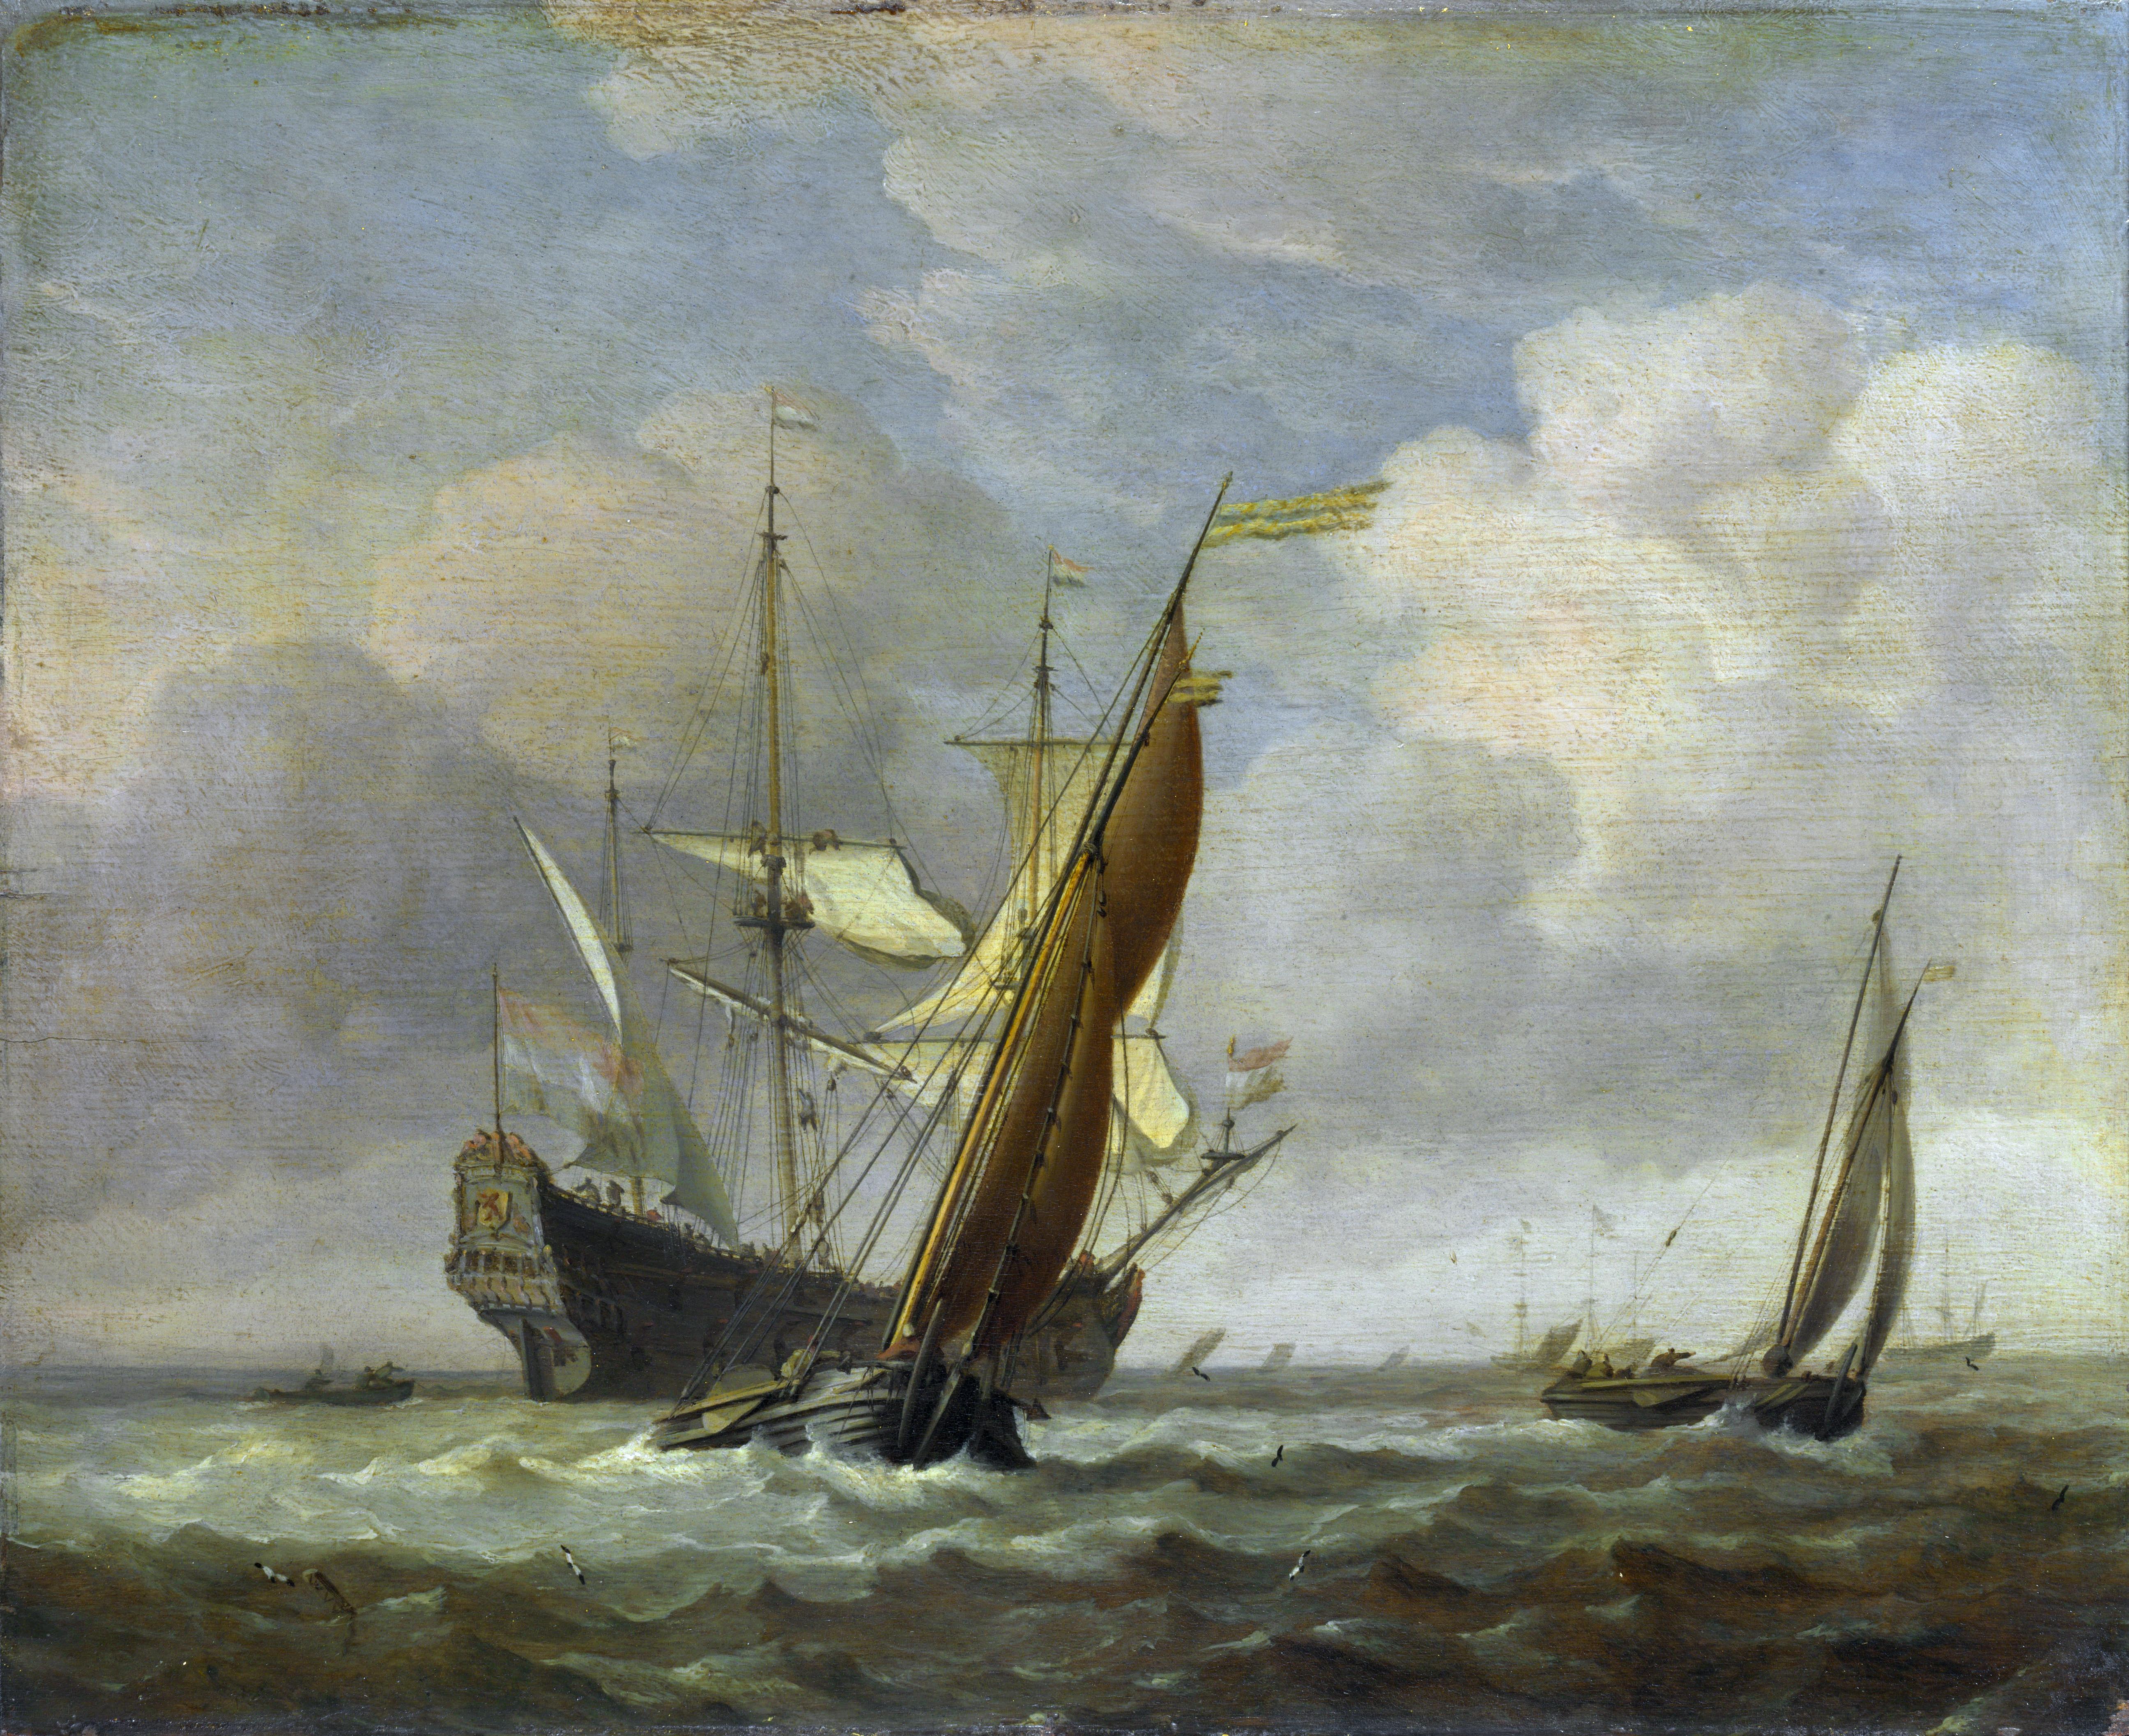 file willem van de velde ii two small vessels and a dutch man of